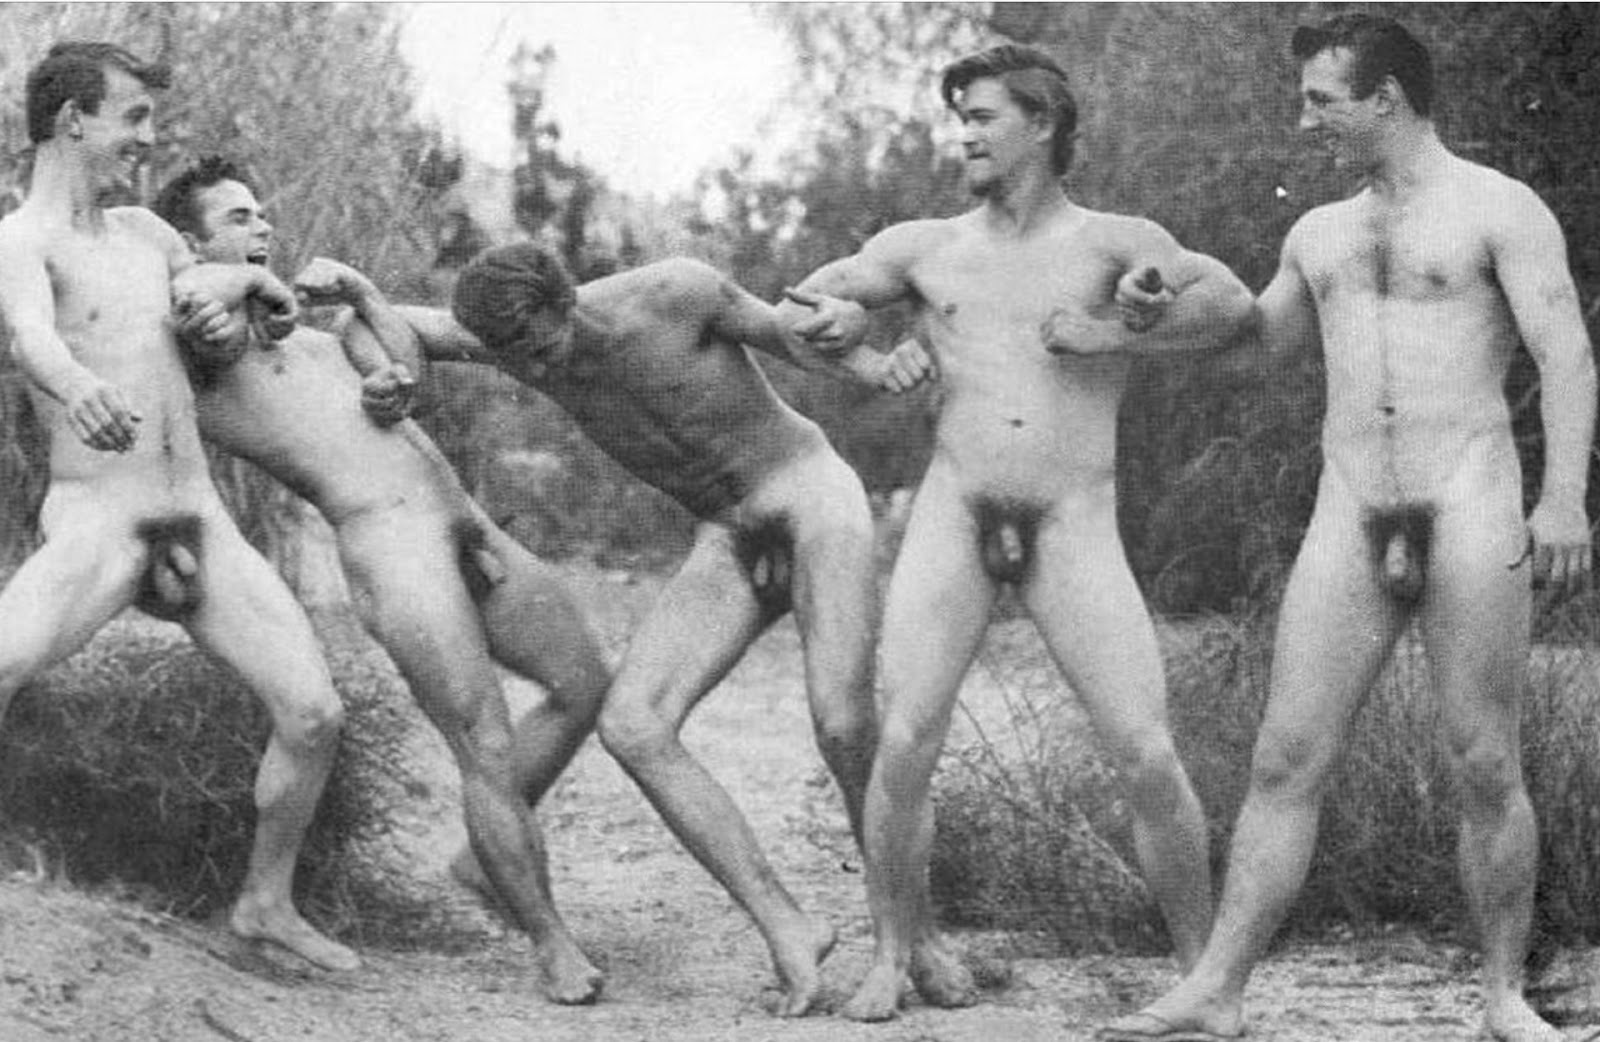 Cocky Boys Free Gay German Men Sex Hole Tumblr